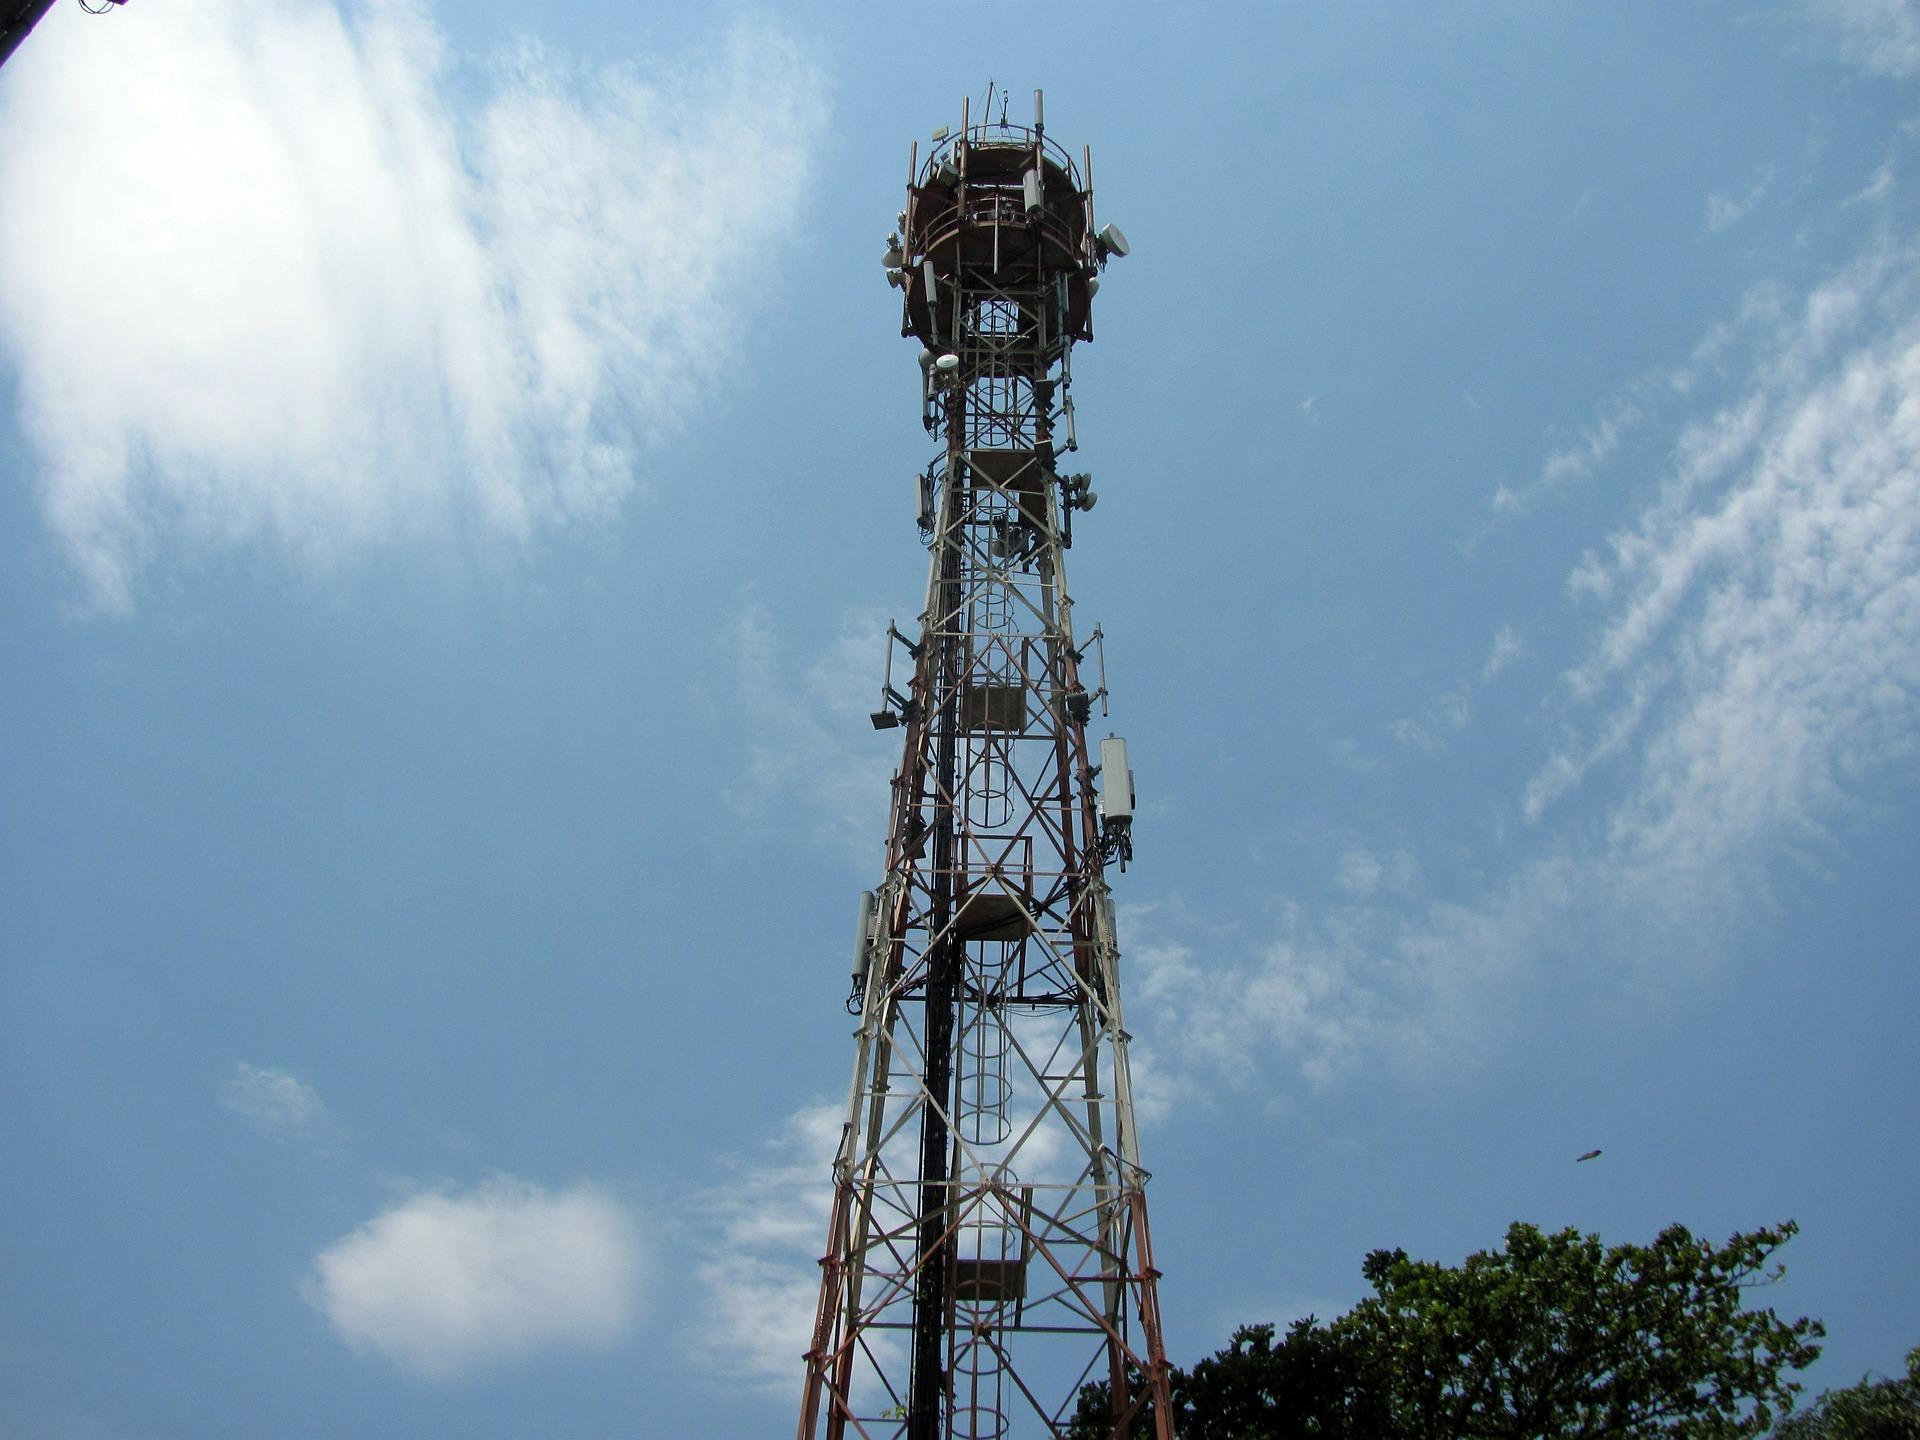 antenna-543431_1920.jpg